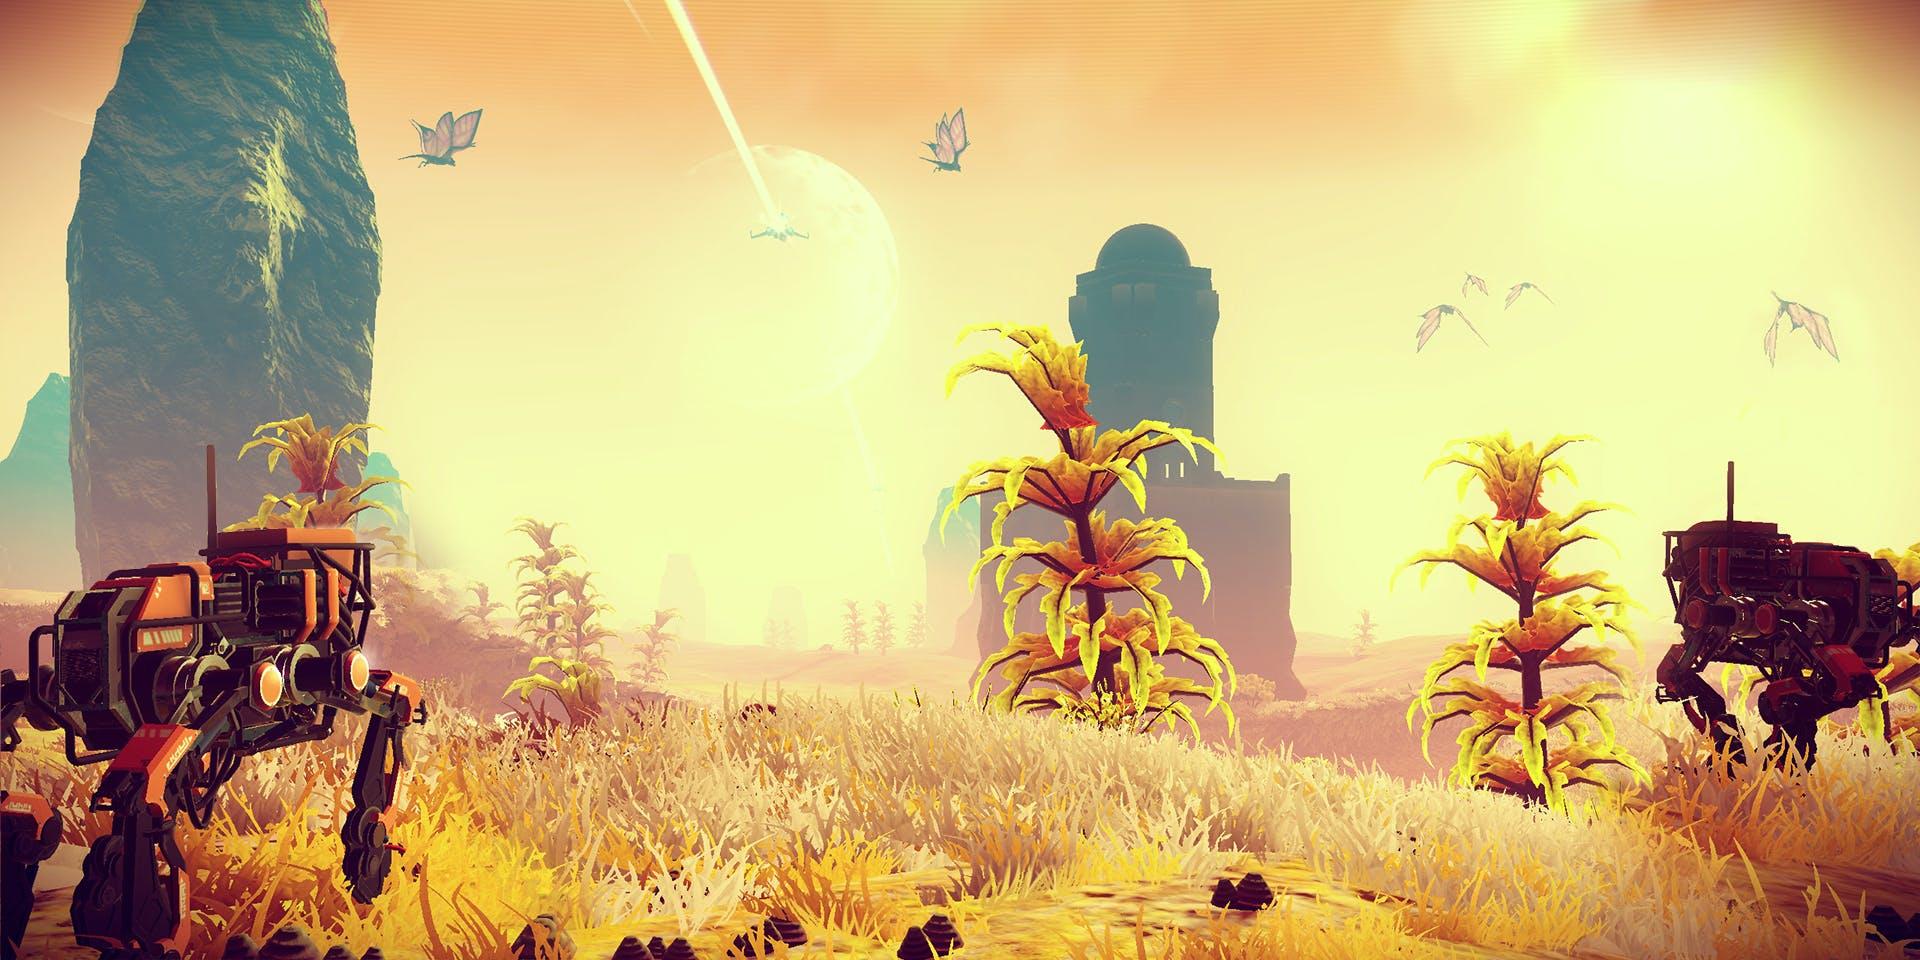 These robots pray to a sun god.